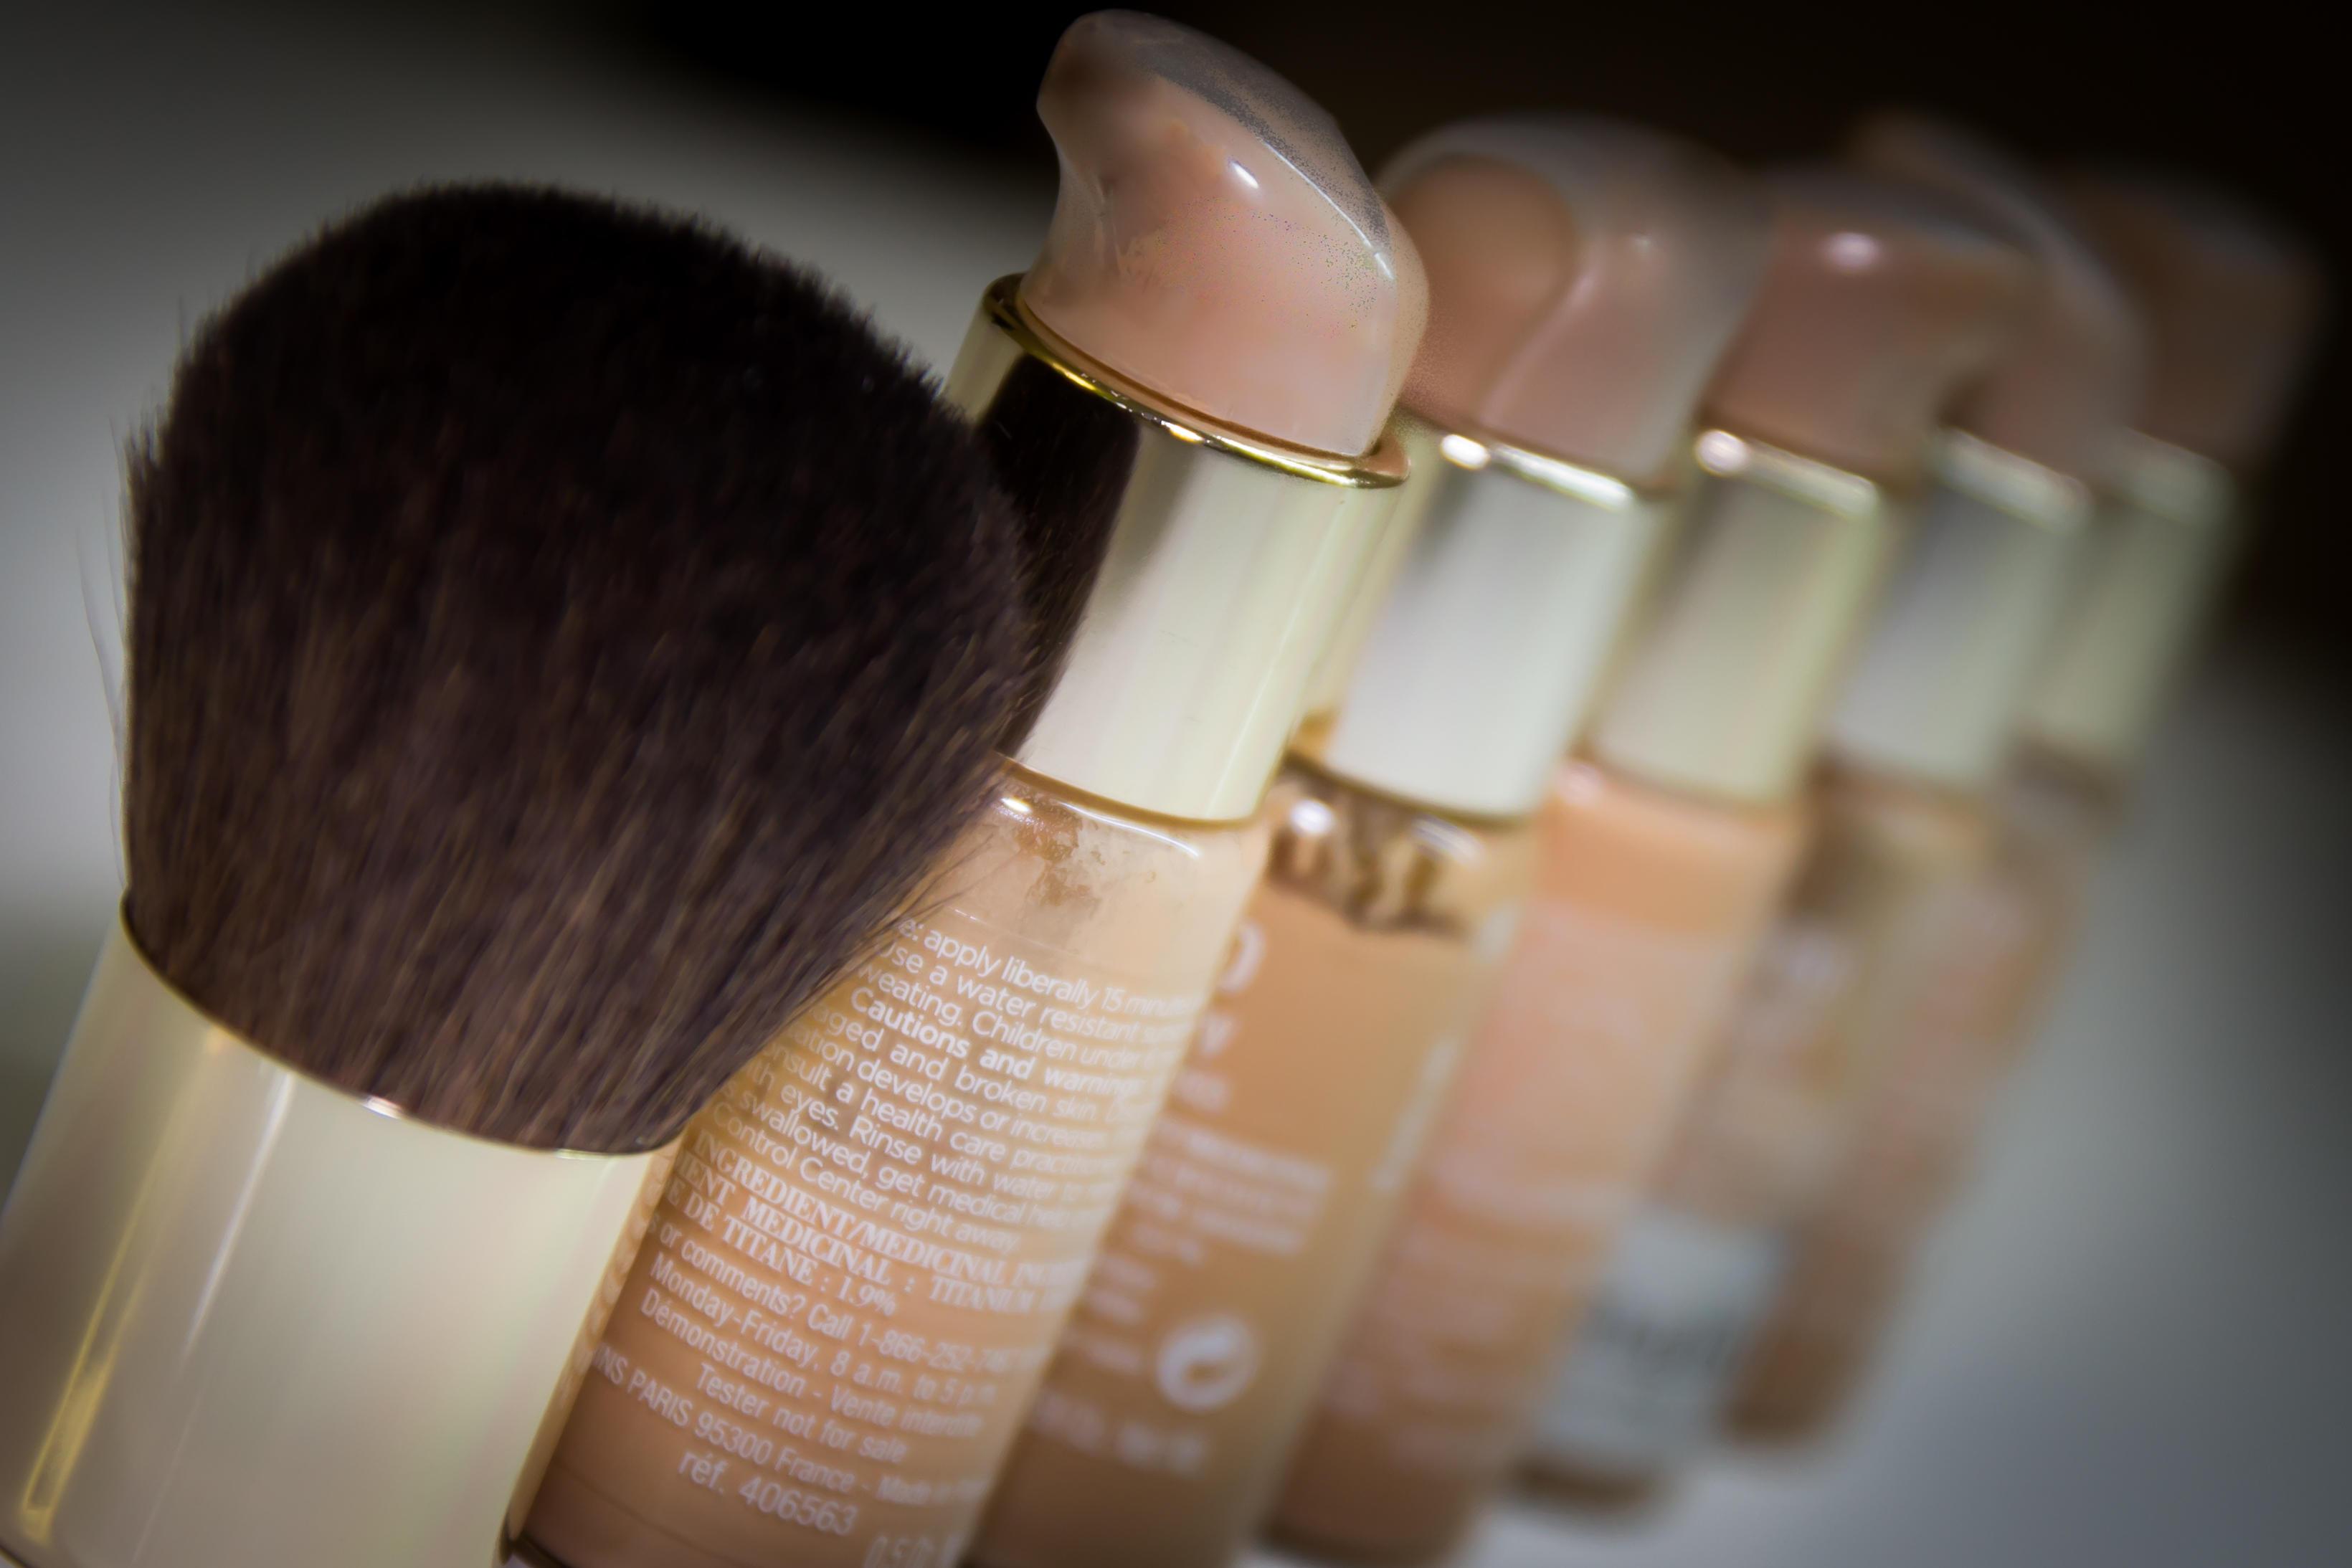 Vitalis Kosmetik